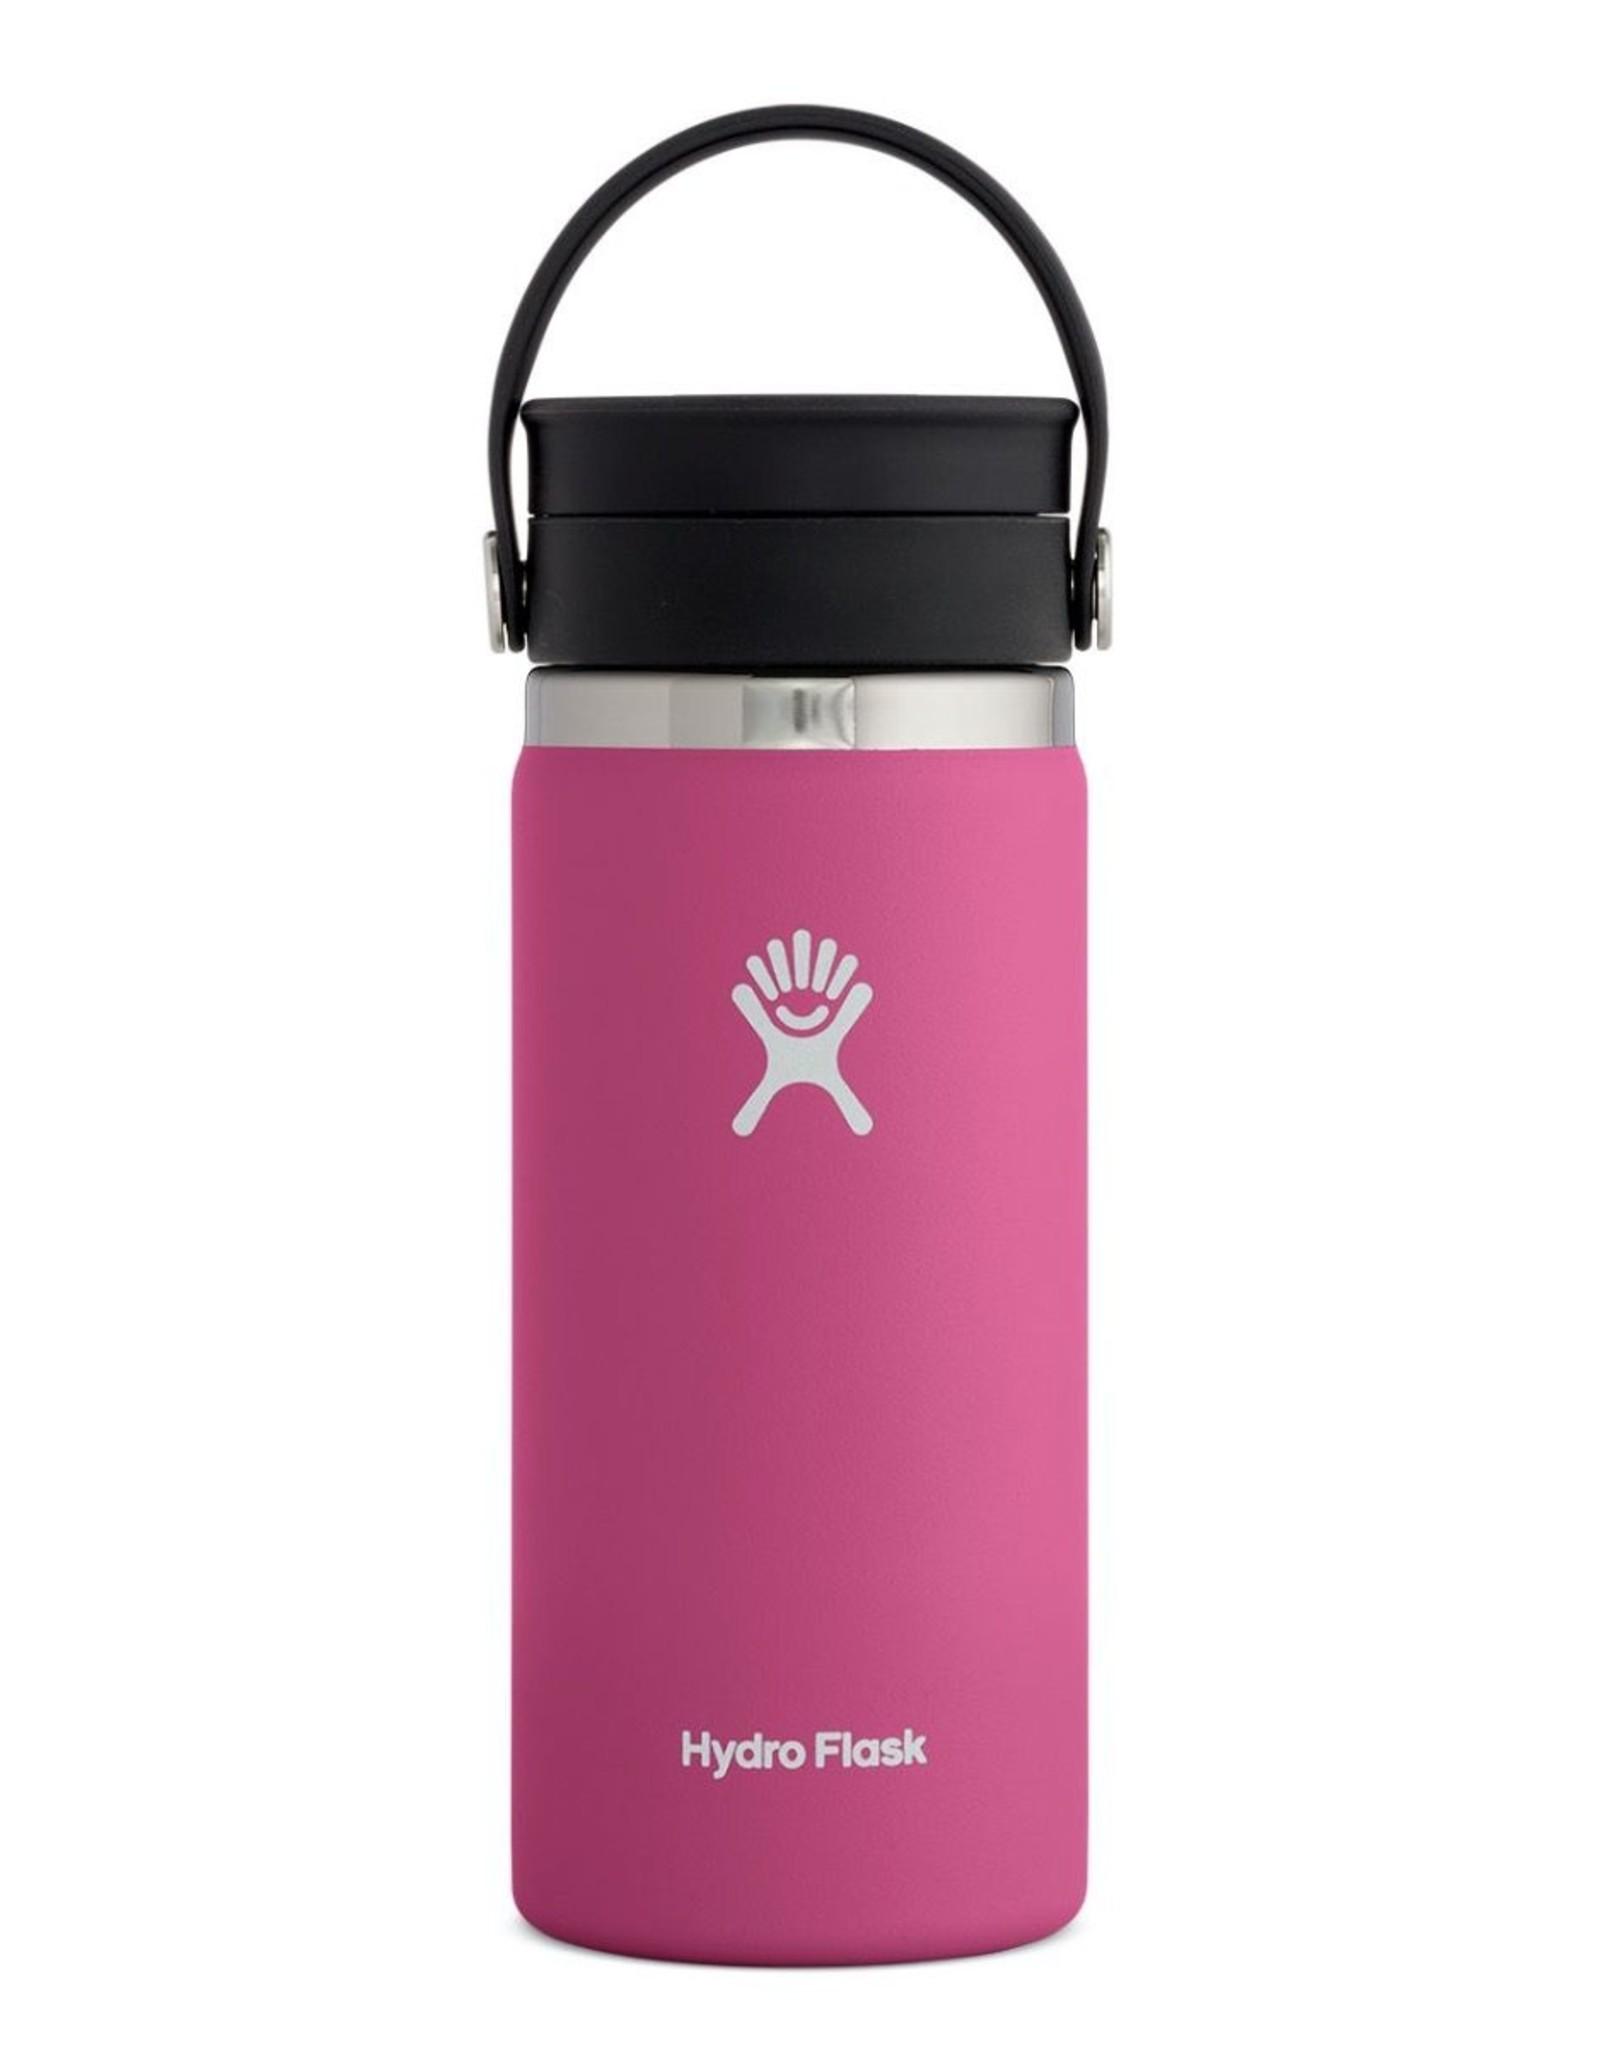 Hydroflask HYDROFLASK 16 OZ WIDE MOUTH FLEX SIP LID